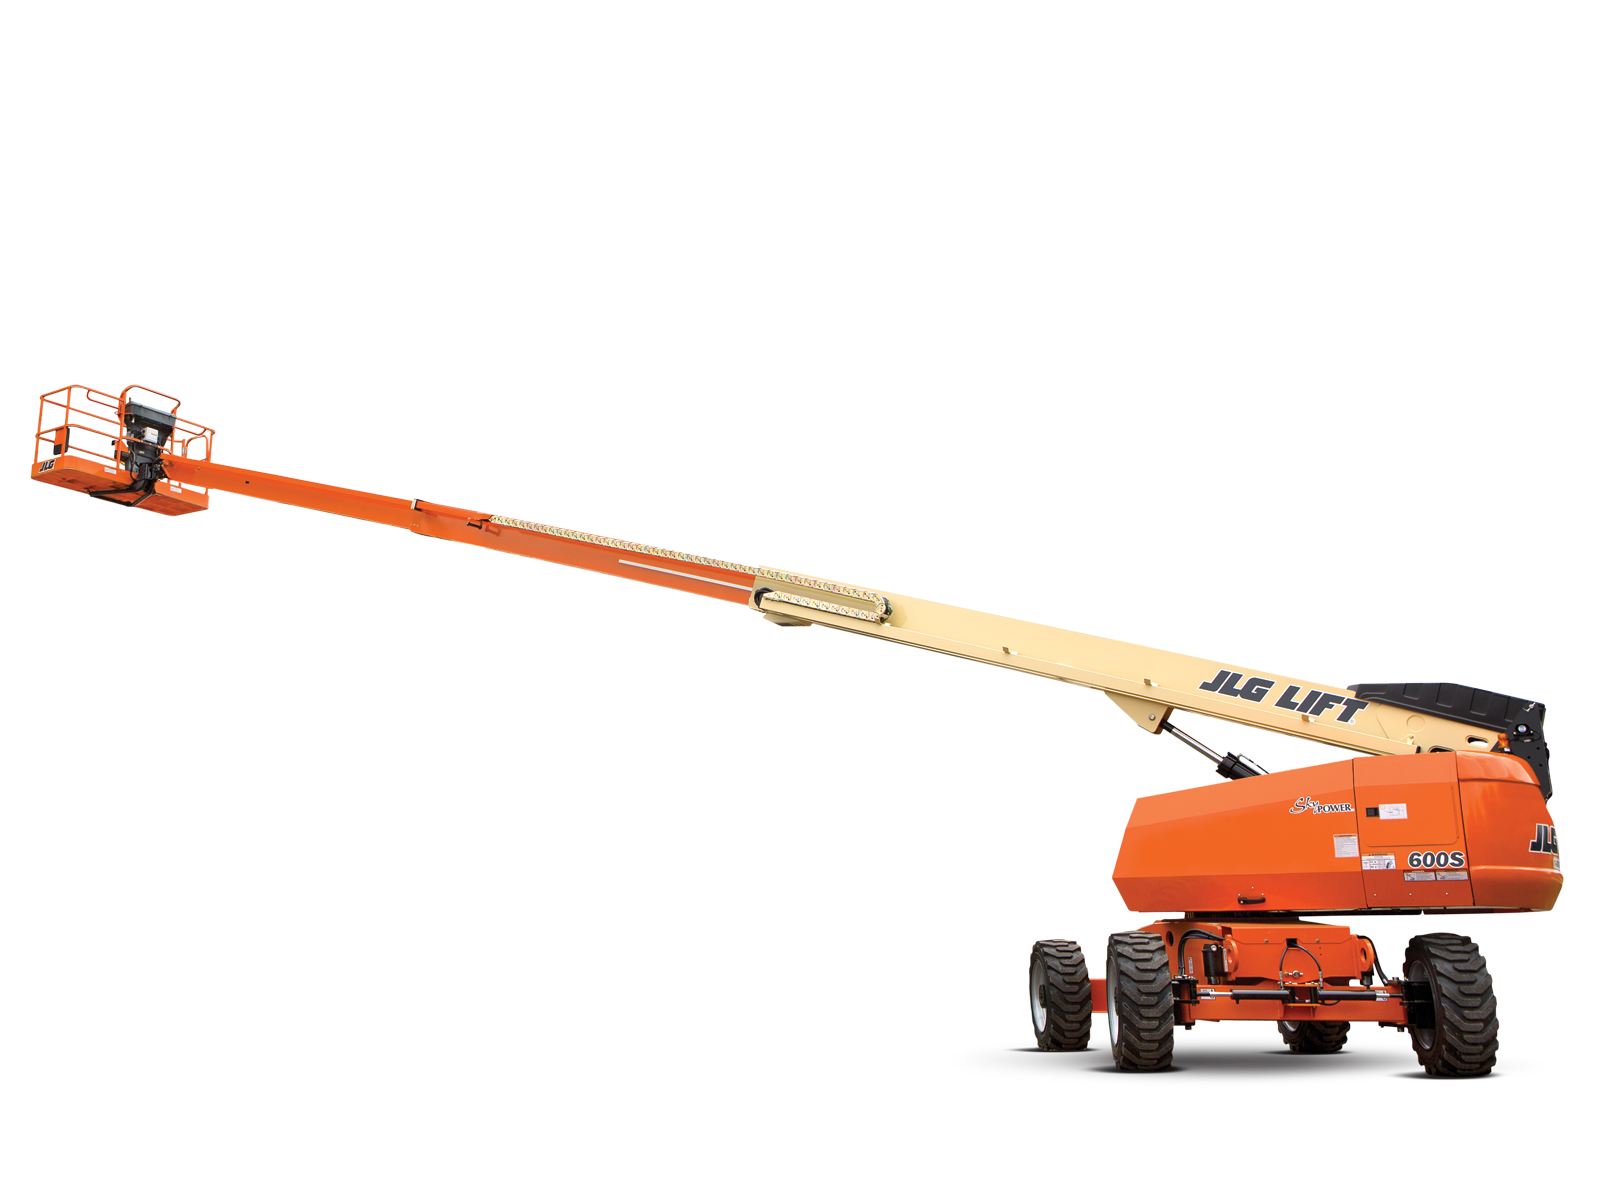 Jlg Boom Lift : S telescopic boom lift jlg